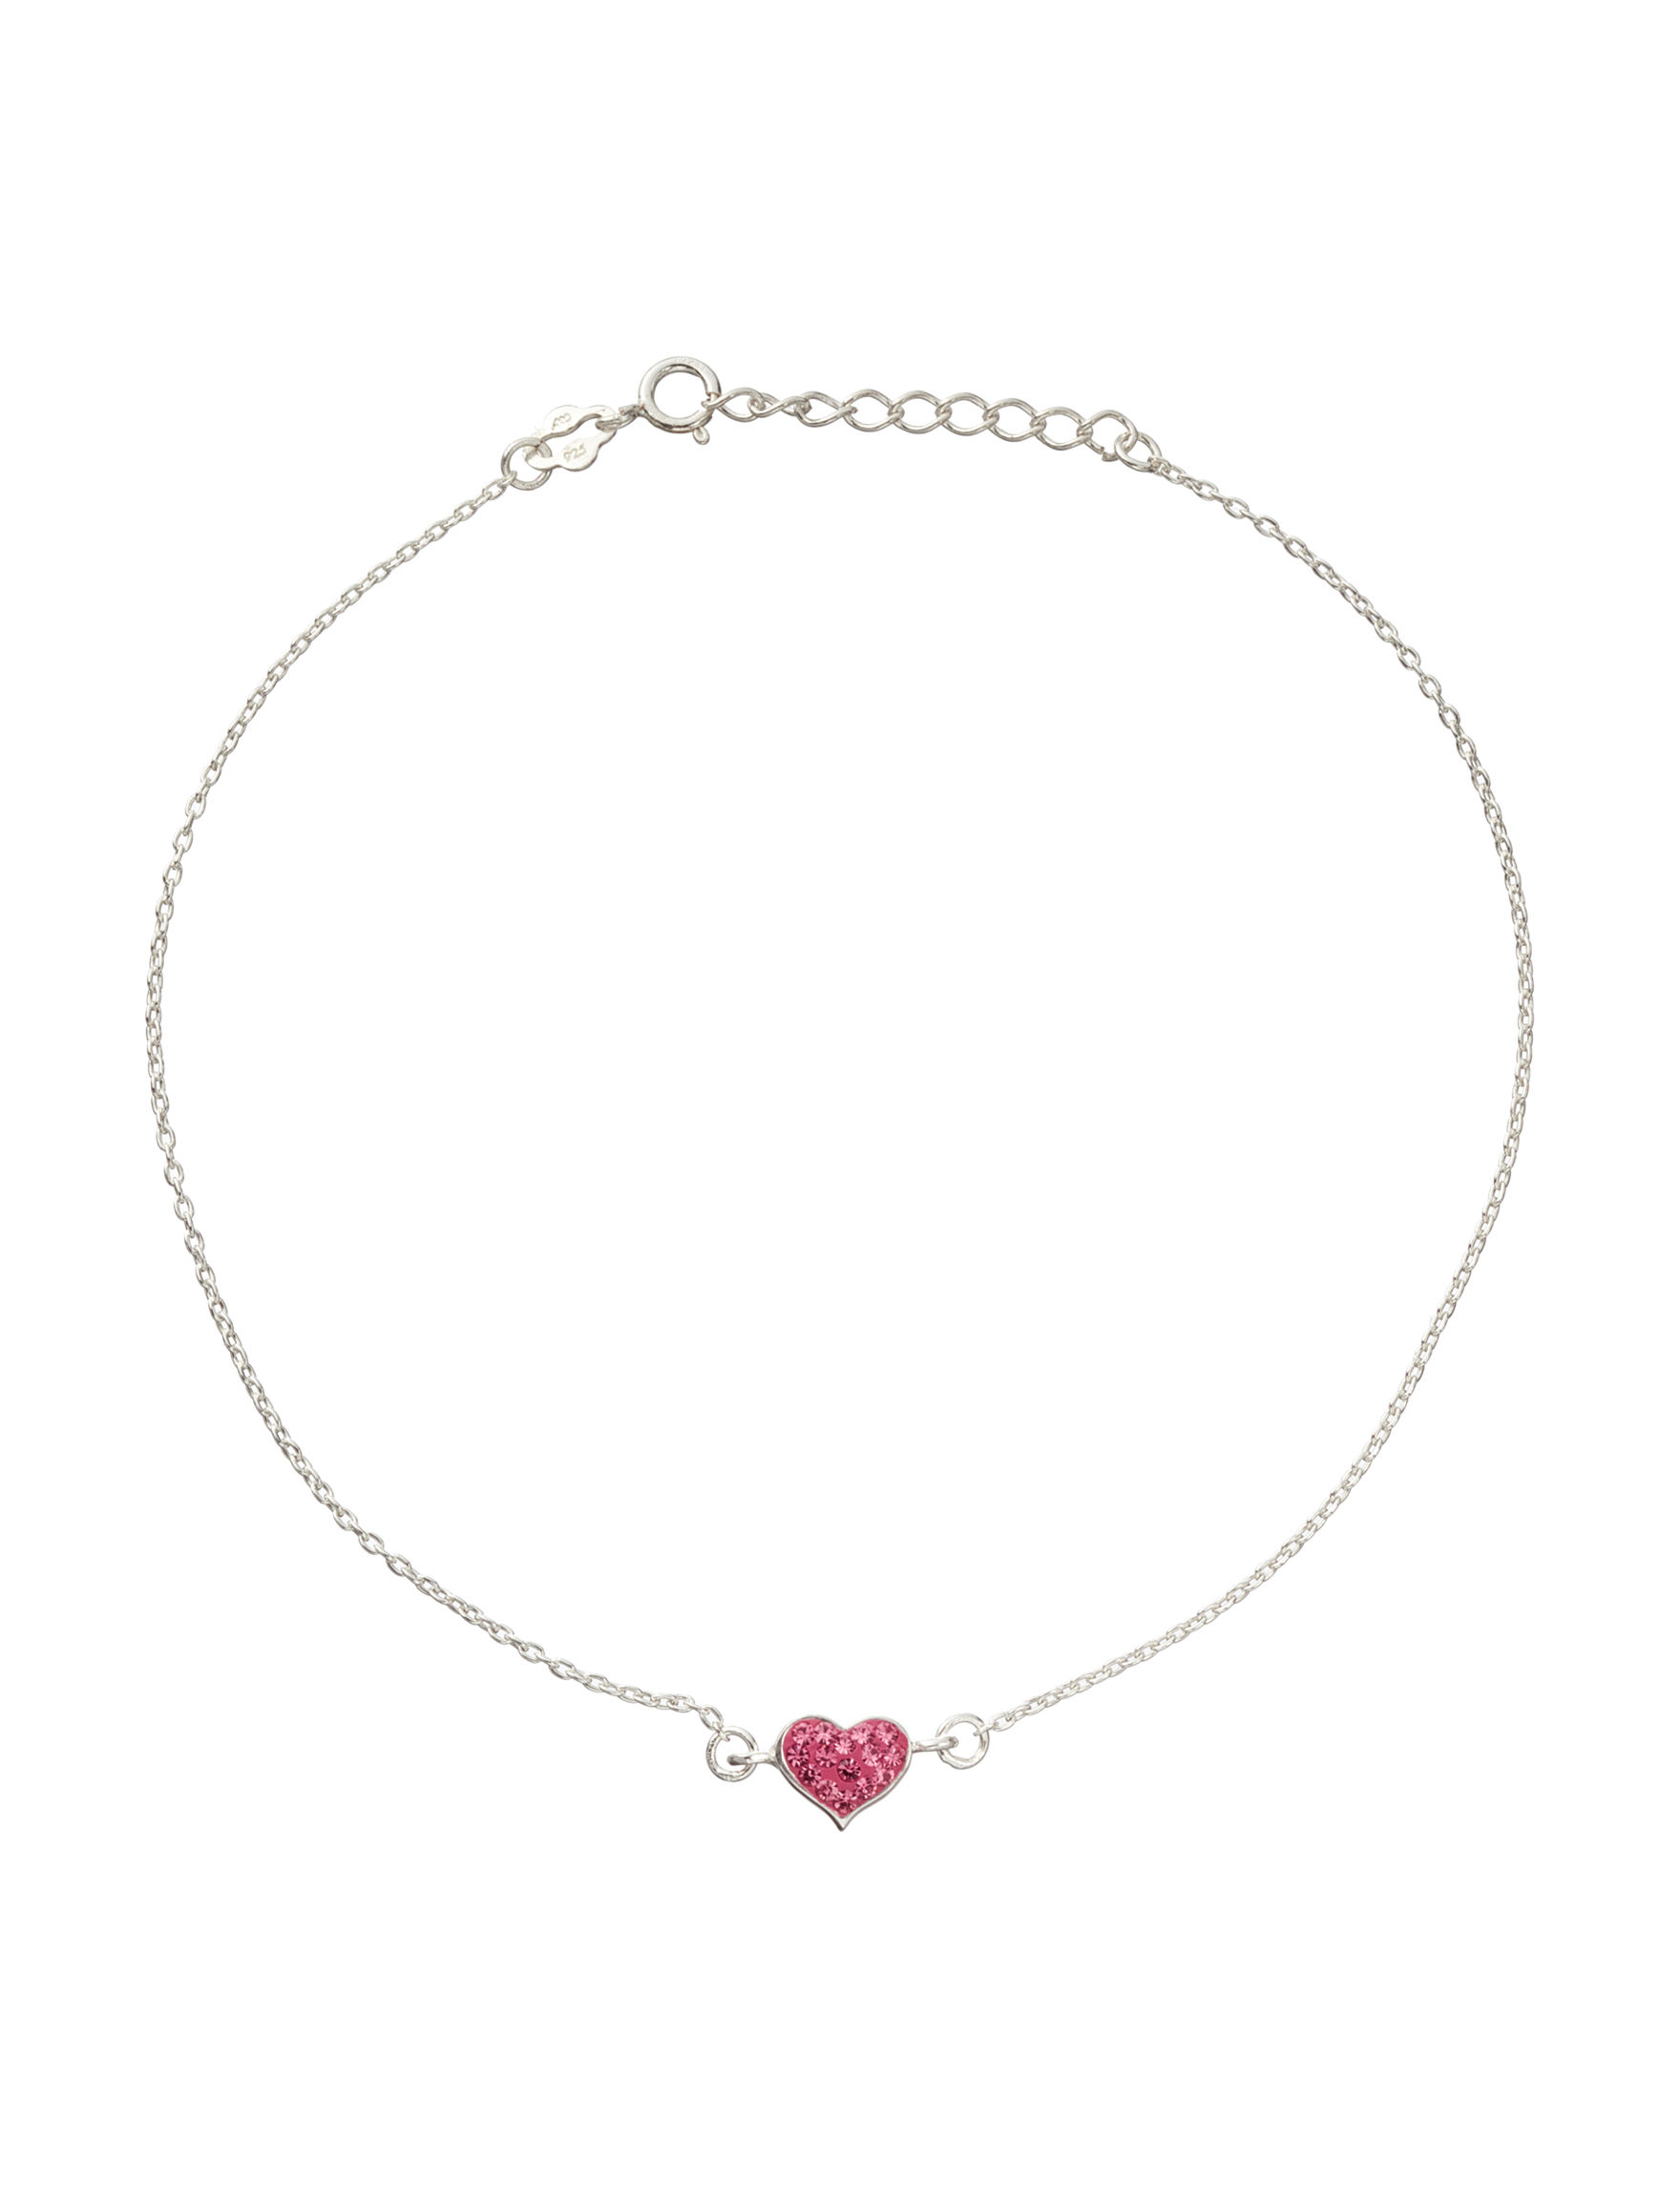 Marsala Pink Anklets Fine Jewelry